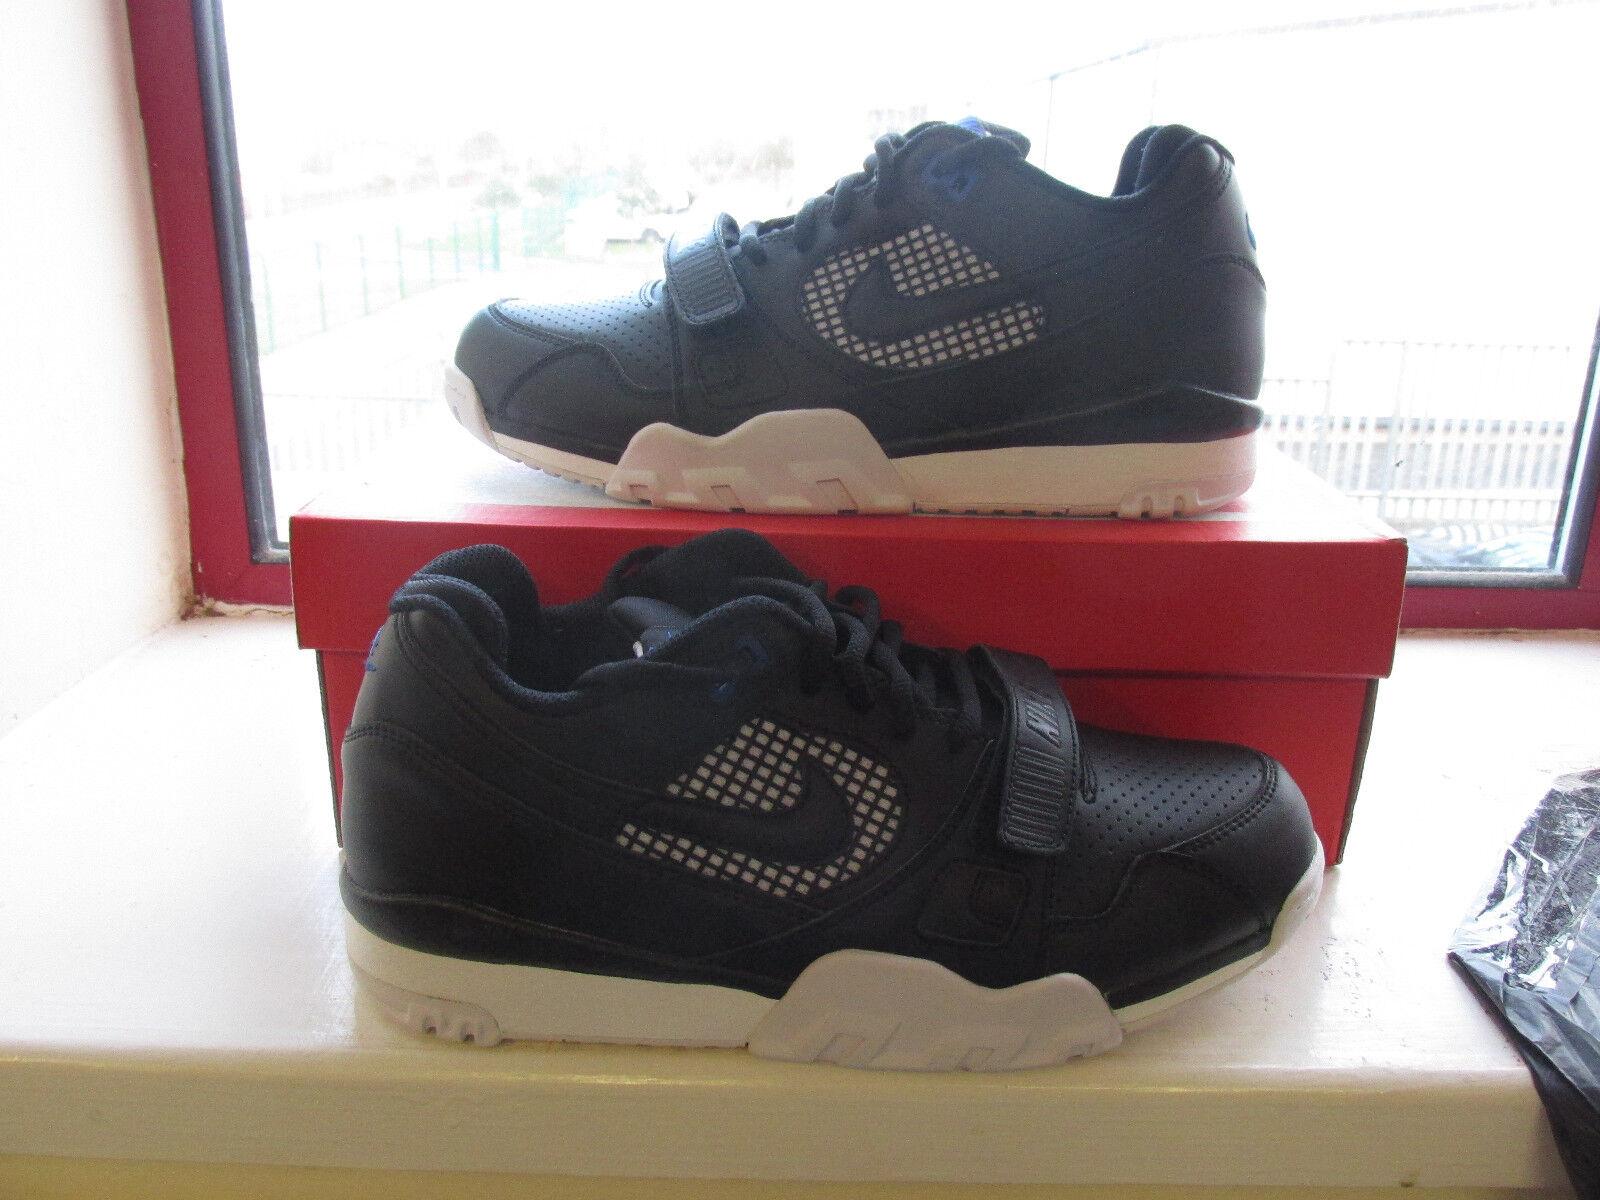 Nike Air Sportschuhe 2 Herren Hoher Turnschuhe 371739 002 Turnschuhe Schuhe